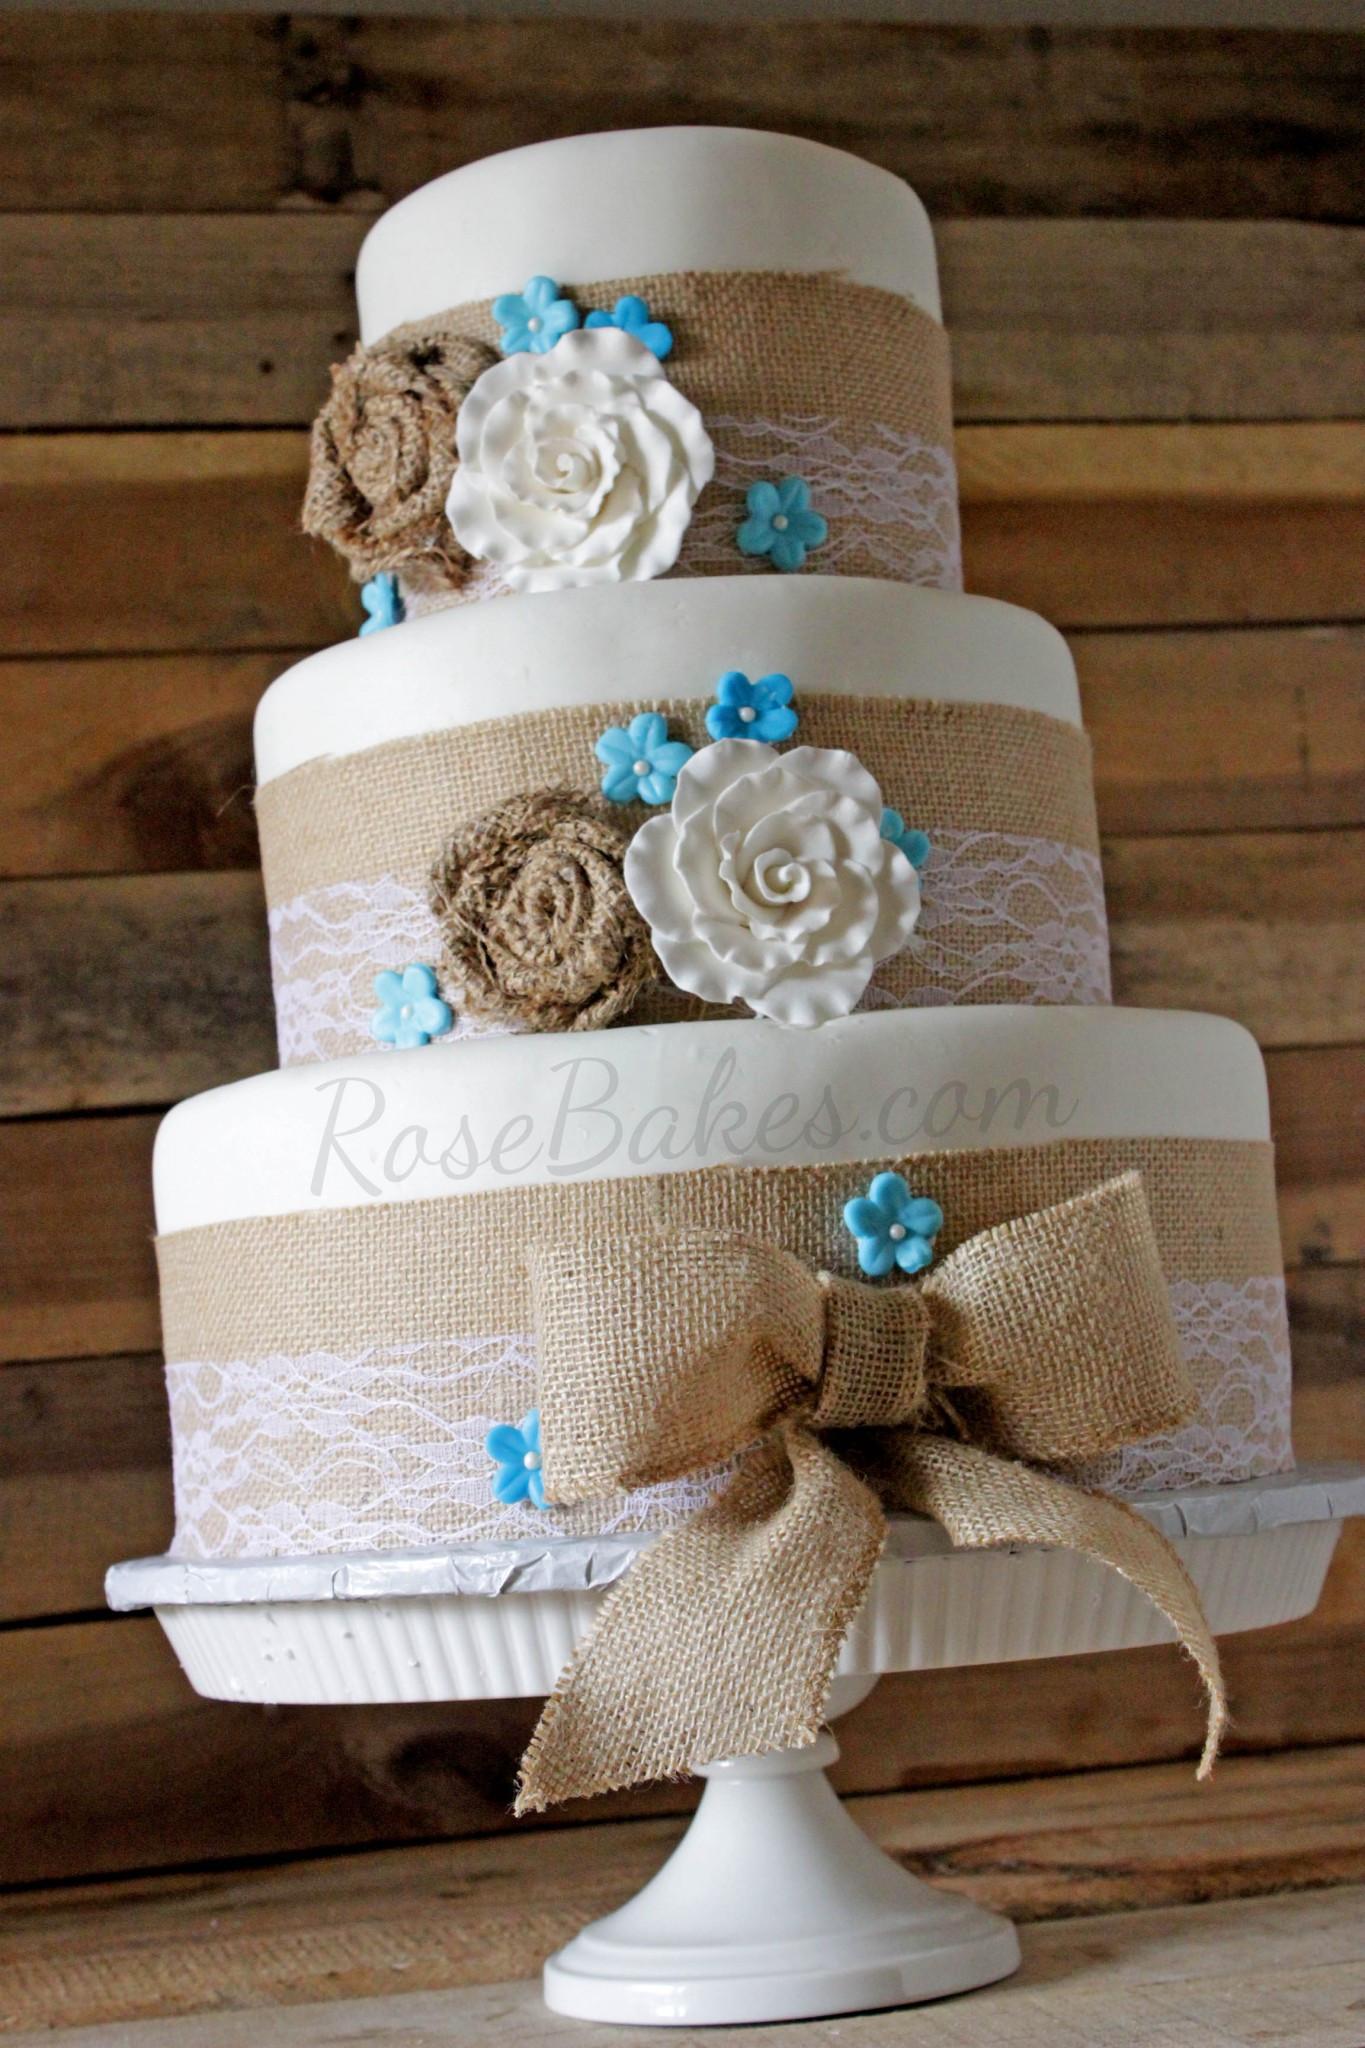 Burlap Wedding Cakes  Burlap & Lace Rustic Wedding Cake Rose Bakes